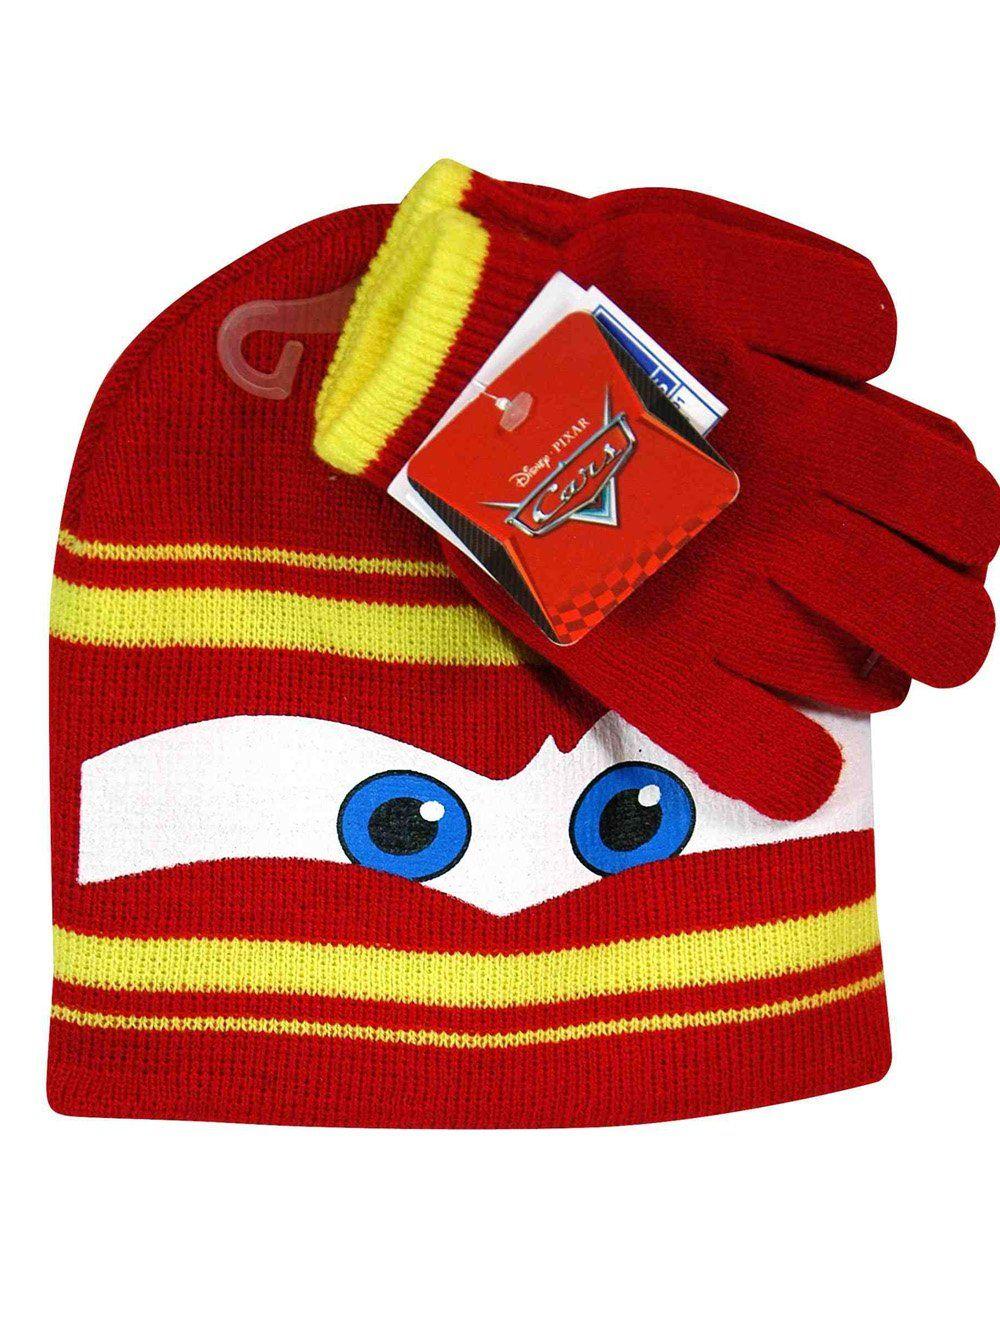 c84d9ee3629 Disney Cars Lightning Mcqueen Winter Beanie Hat   Gloves Set. Material   100% Acrylic